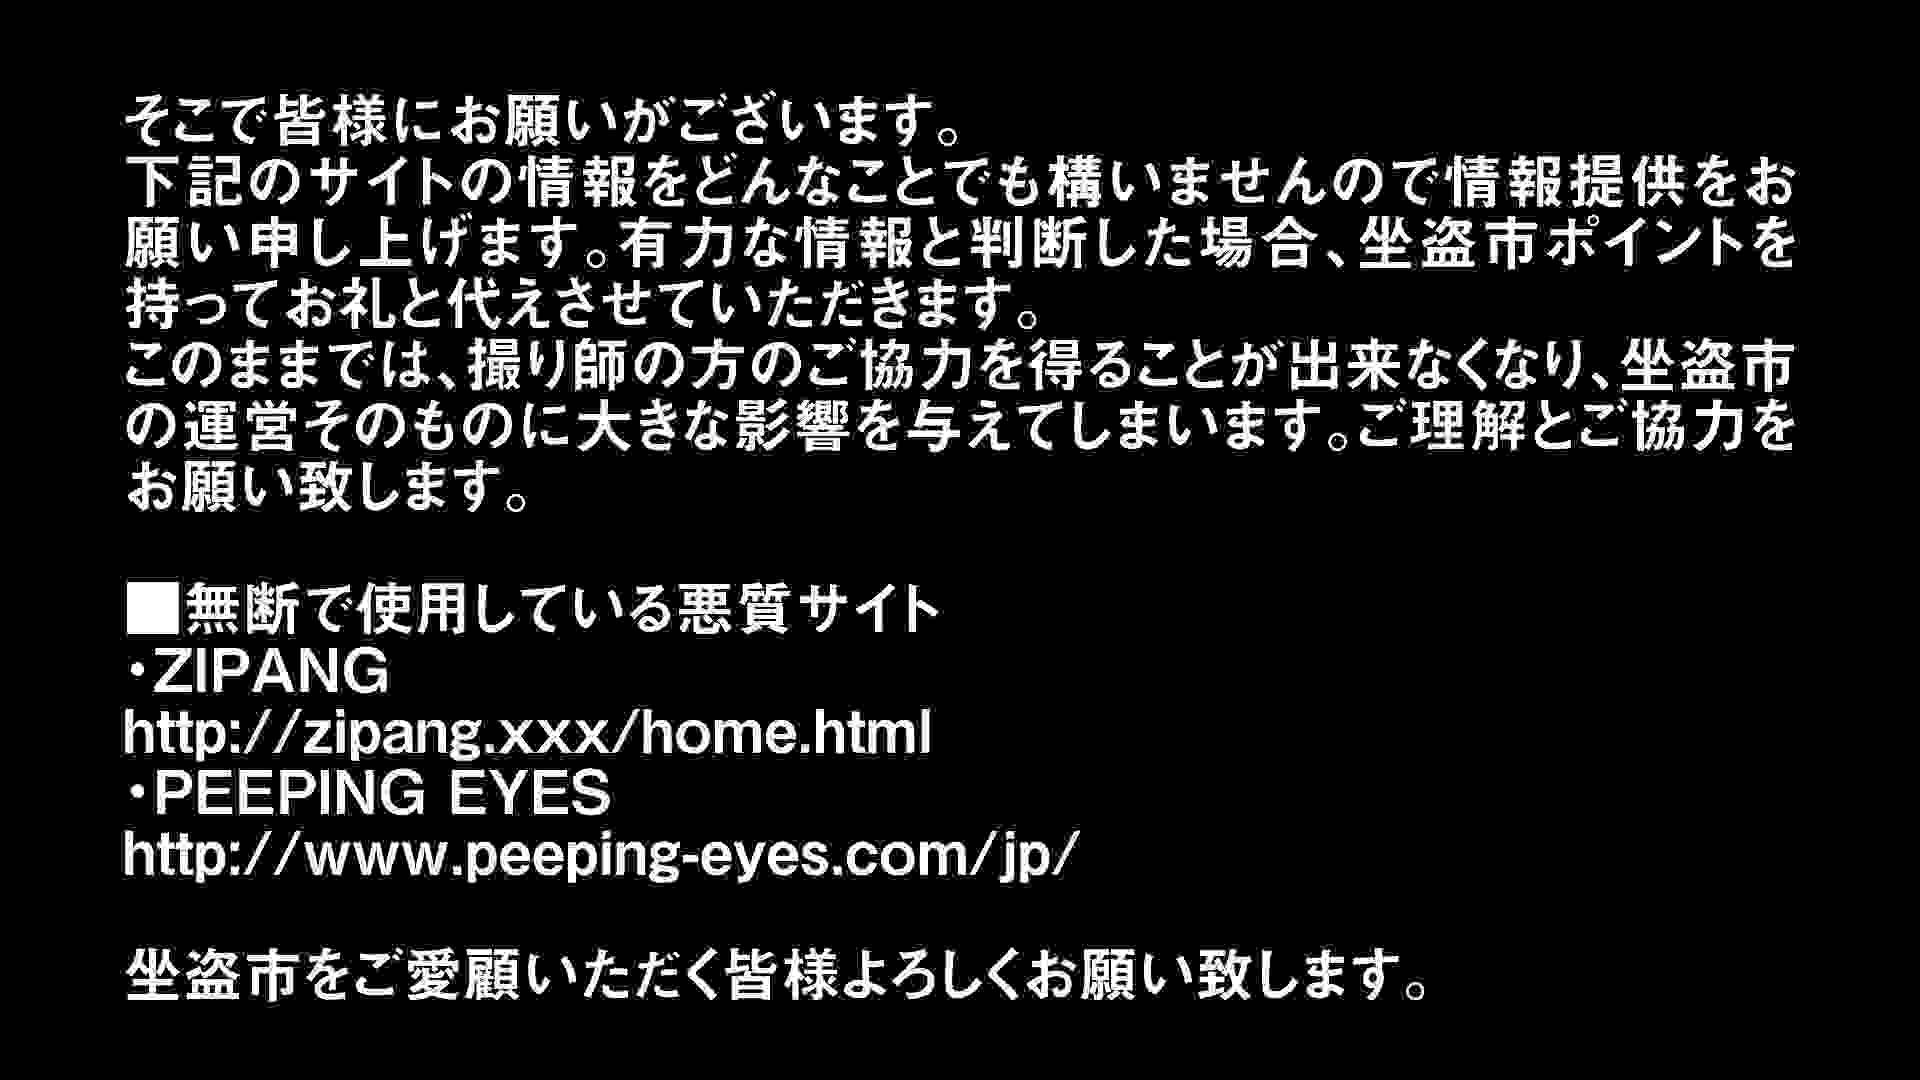 Aquaな露天風呂Vol.296 盗撮 | OLセックス  91画像 40